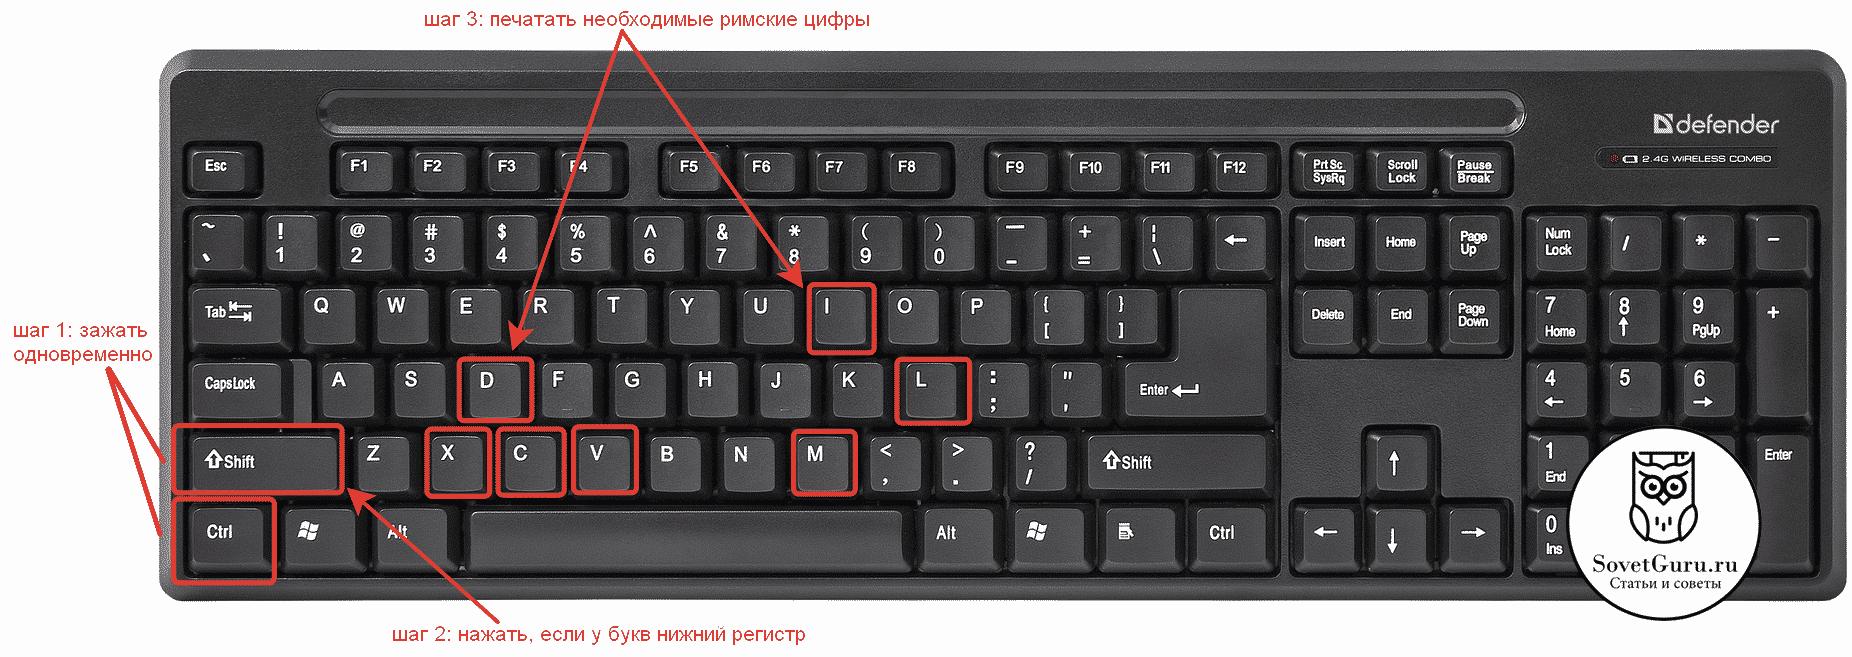 Римские цифры в латинском регистре на клавиатуре | Как написать римские цифры на клавиатуре